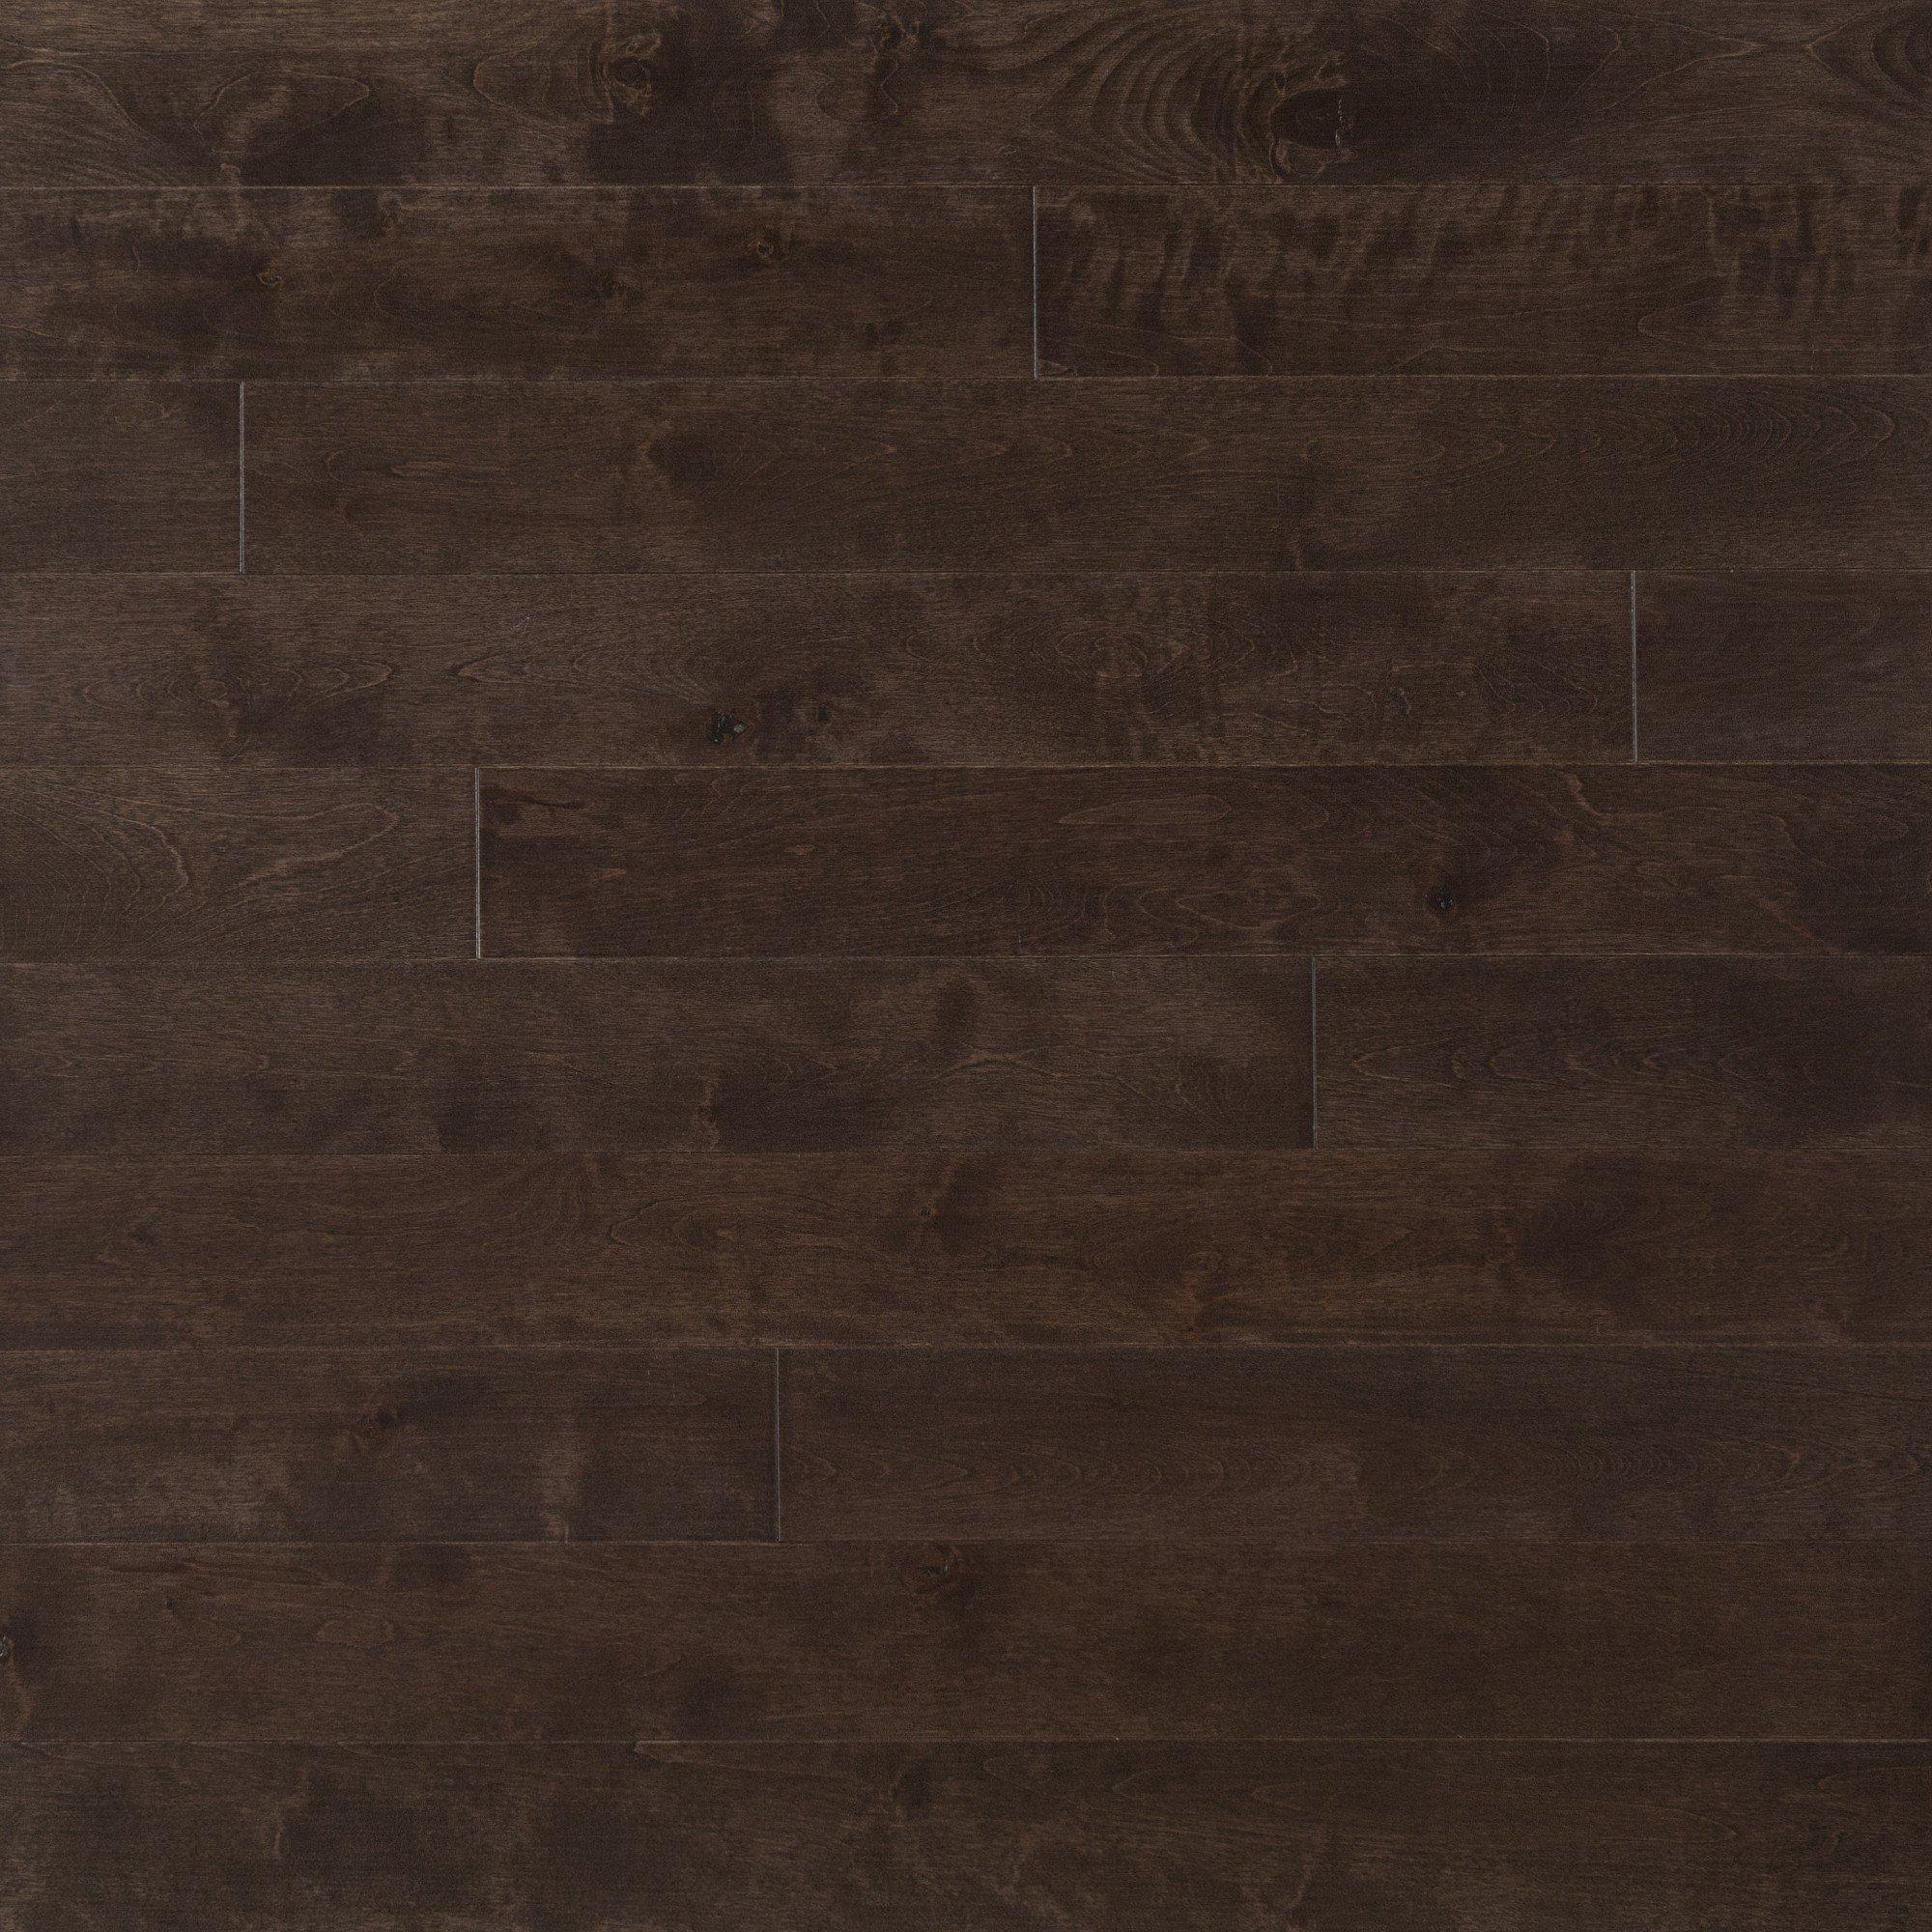 Aged Birch Black Jelly Bean - Floor image